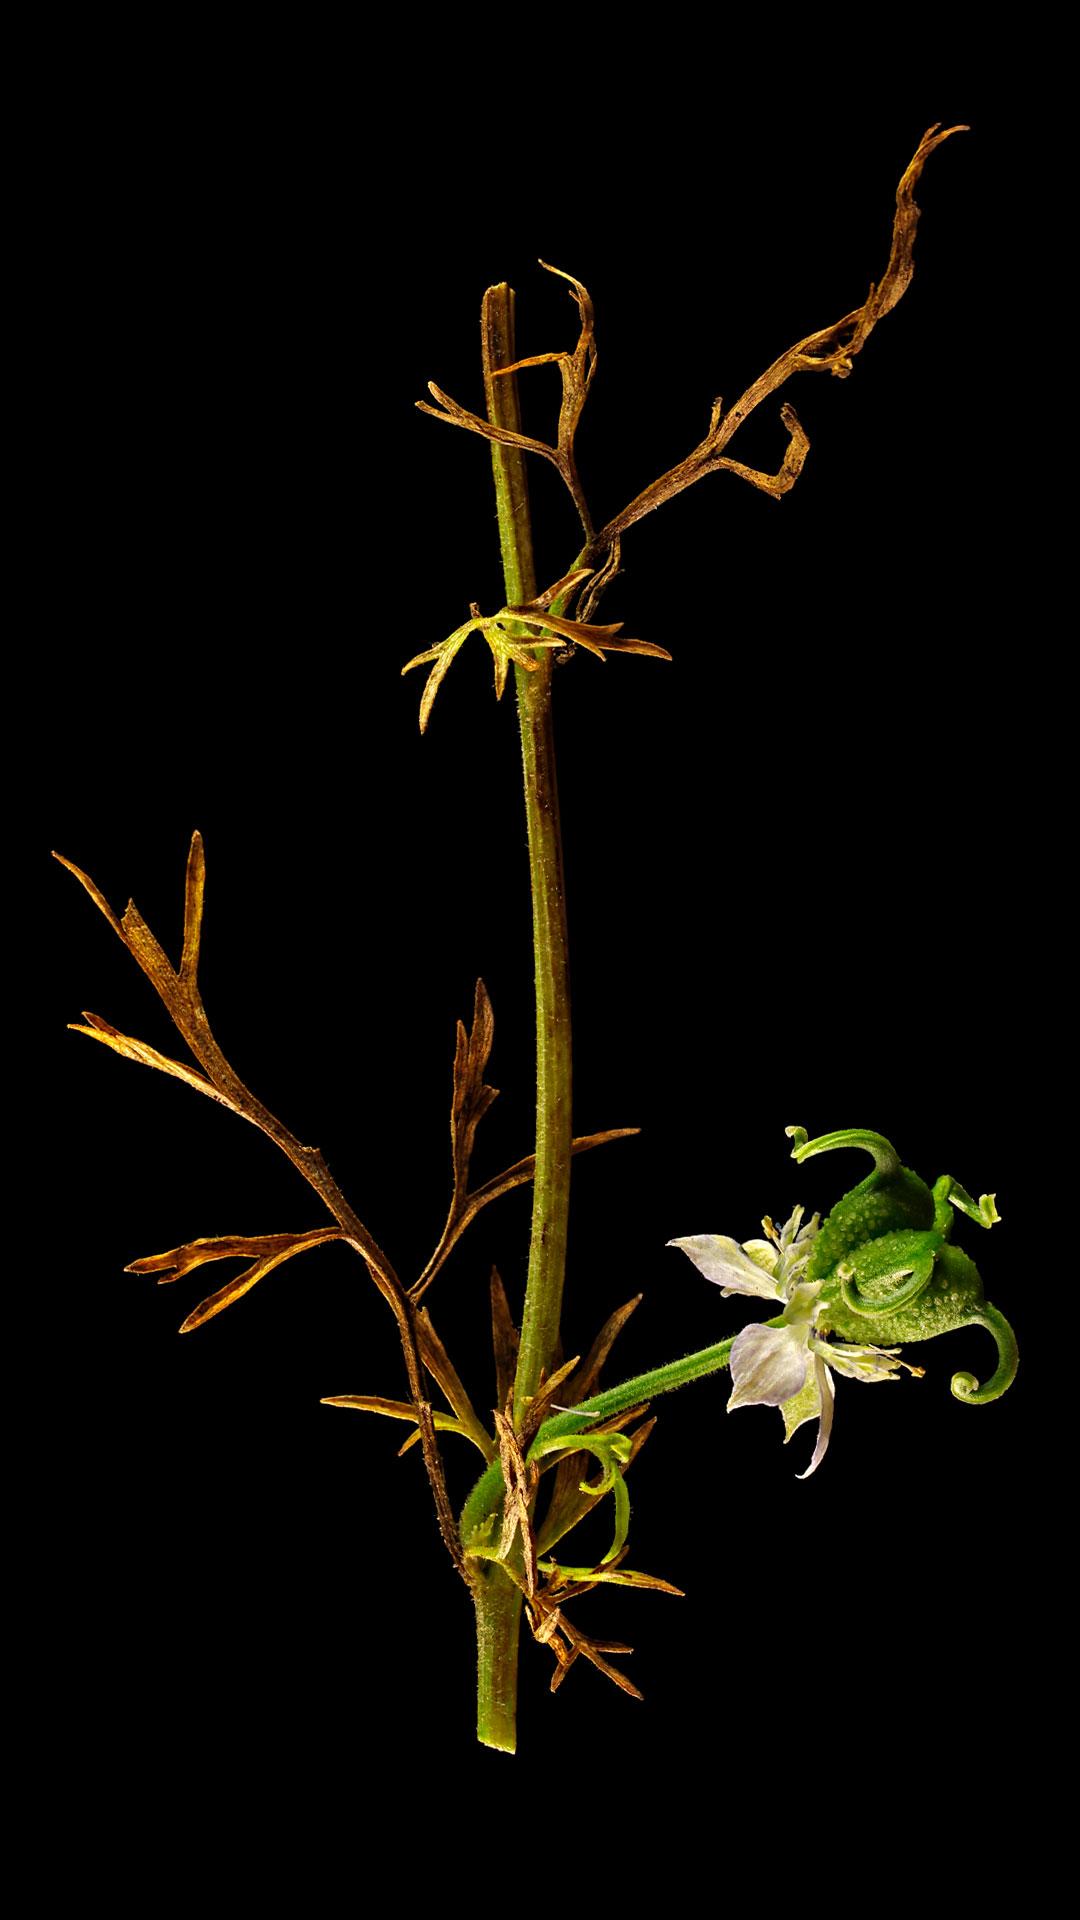 der echte schwarzk mmel nigella sativa flora obscura. Black Bedroom Furniture Sets. Home Design Ideas